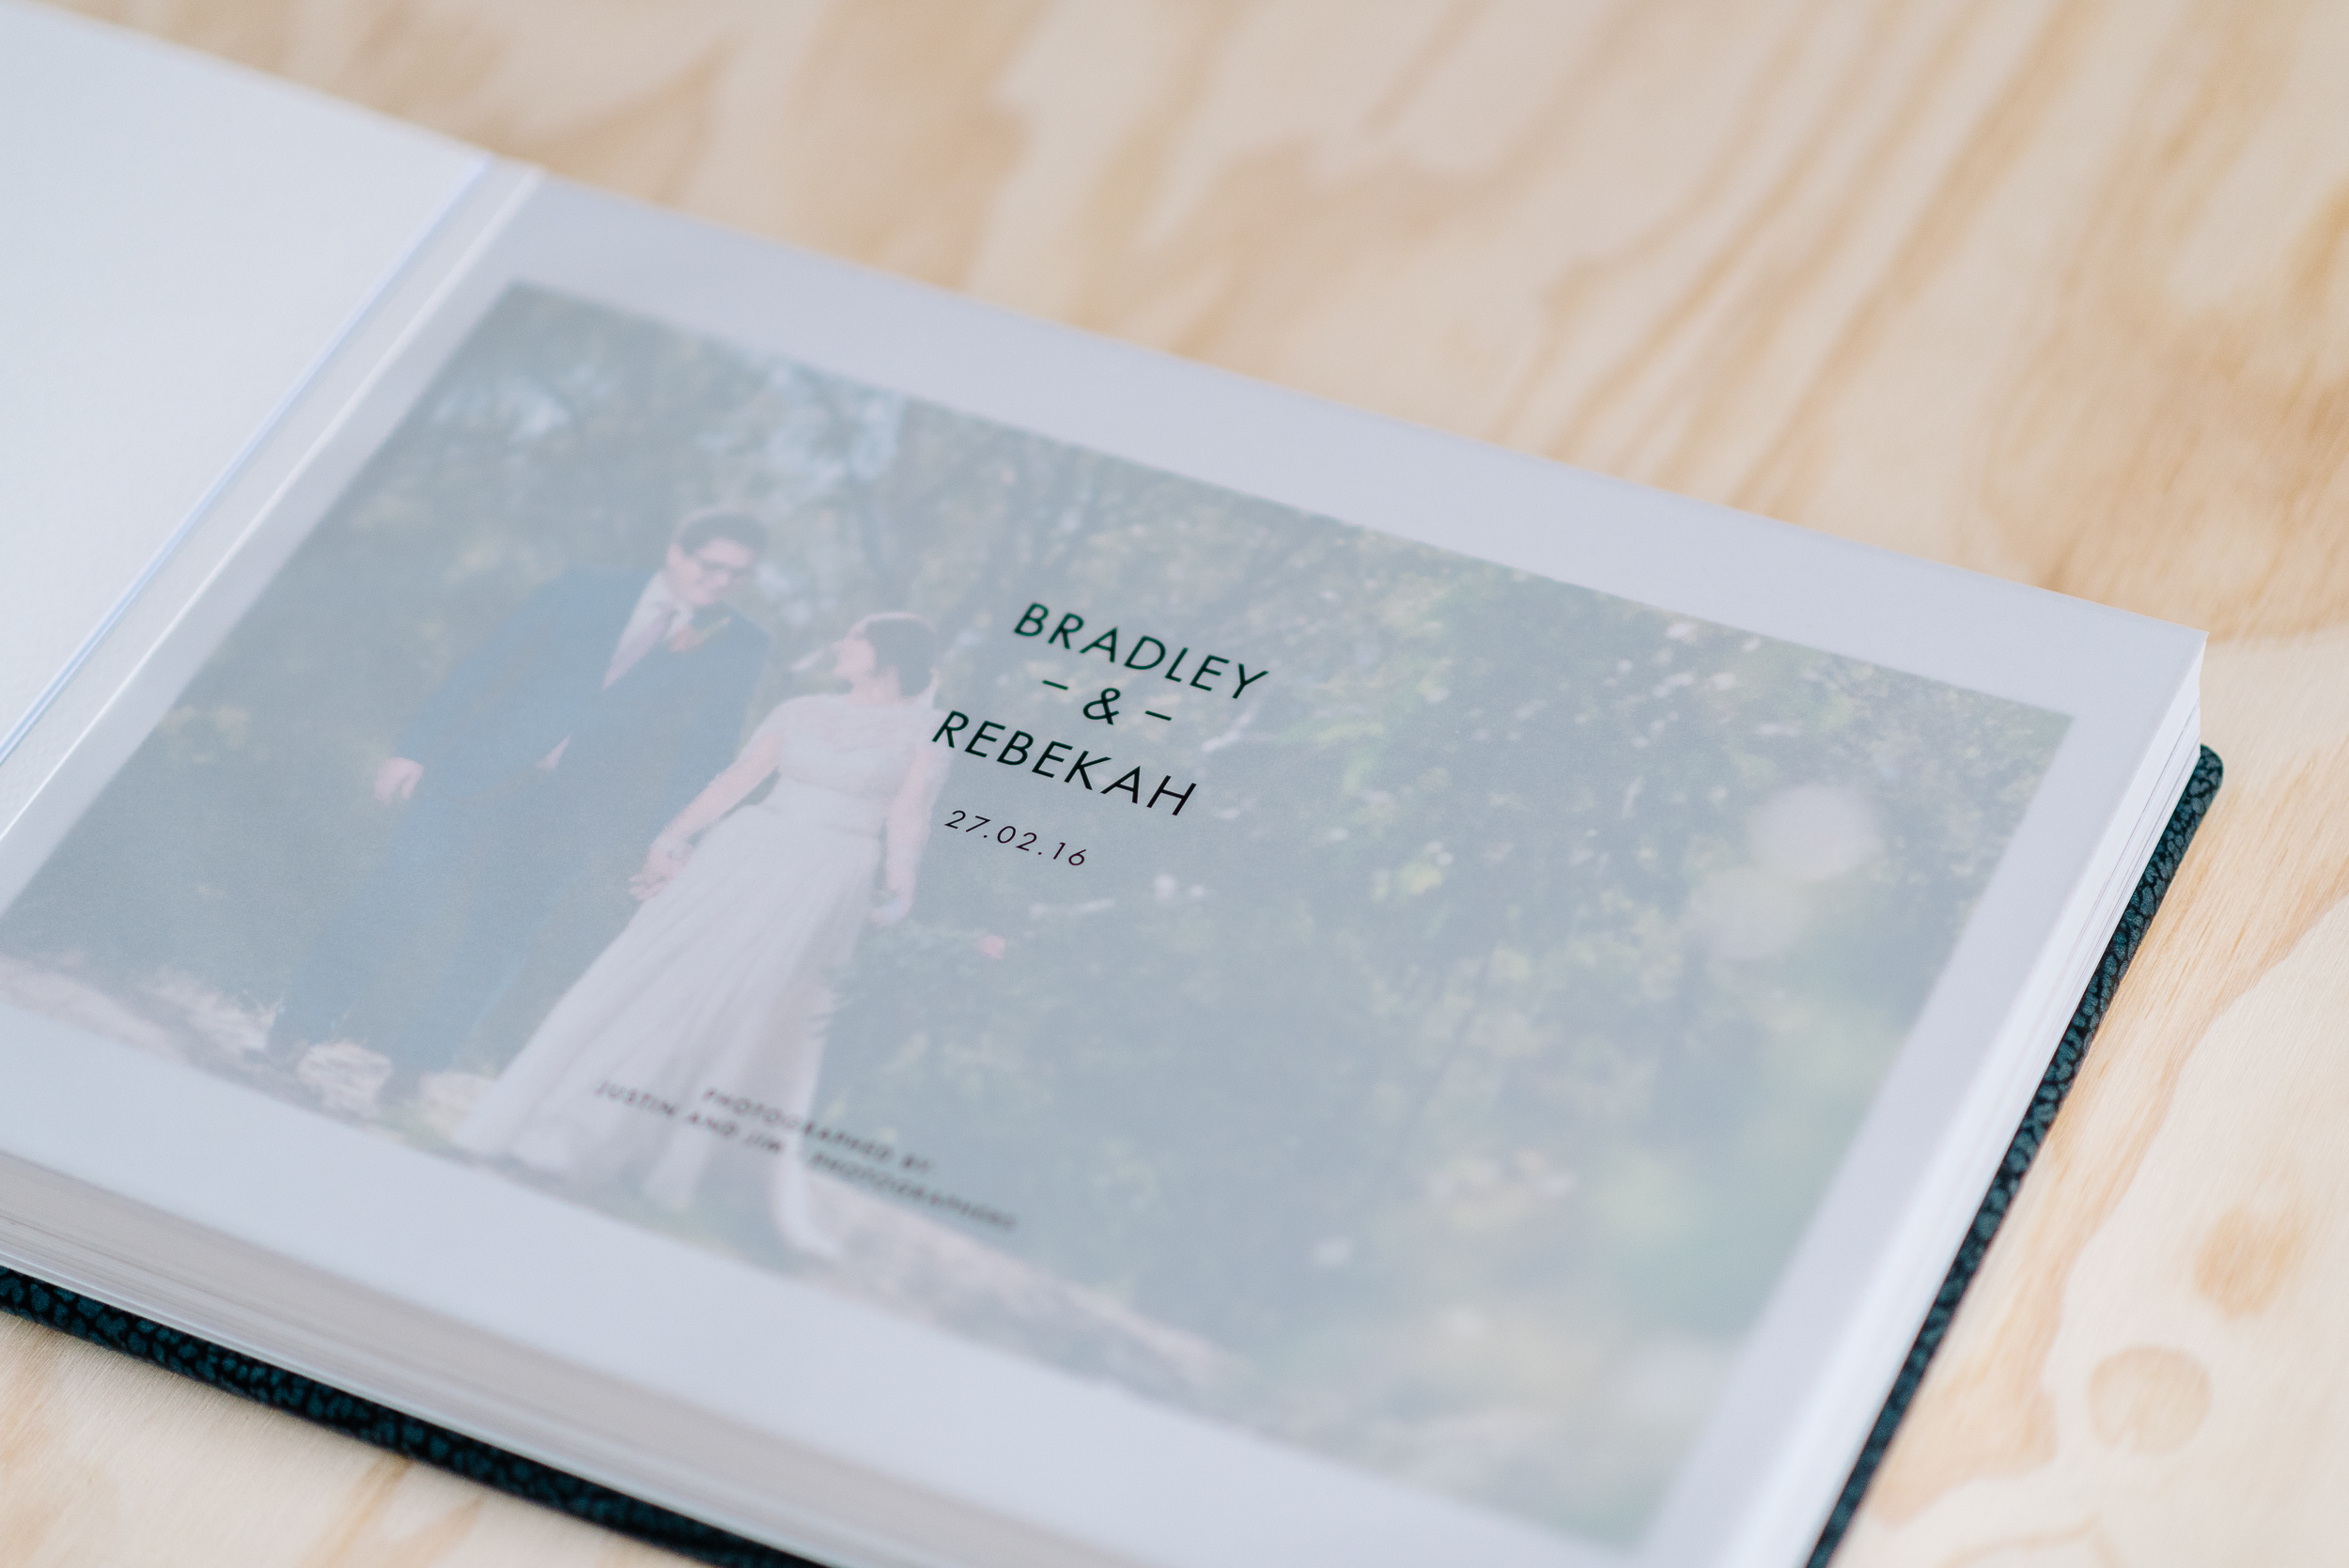 Bradley&Rebekah-2.jpg